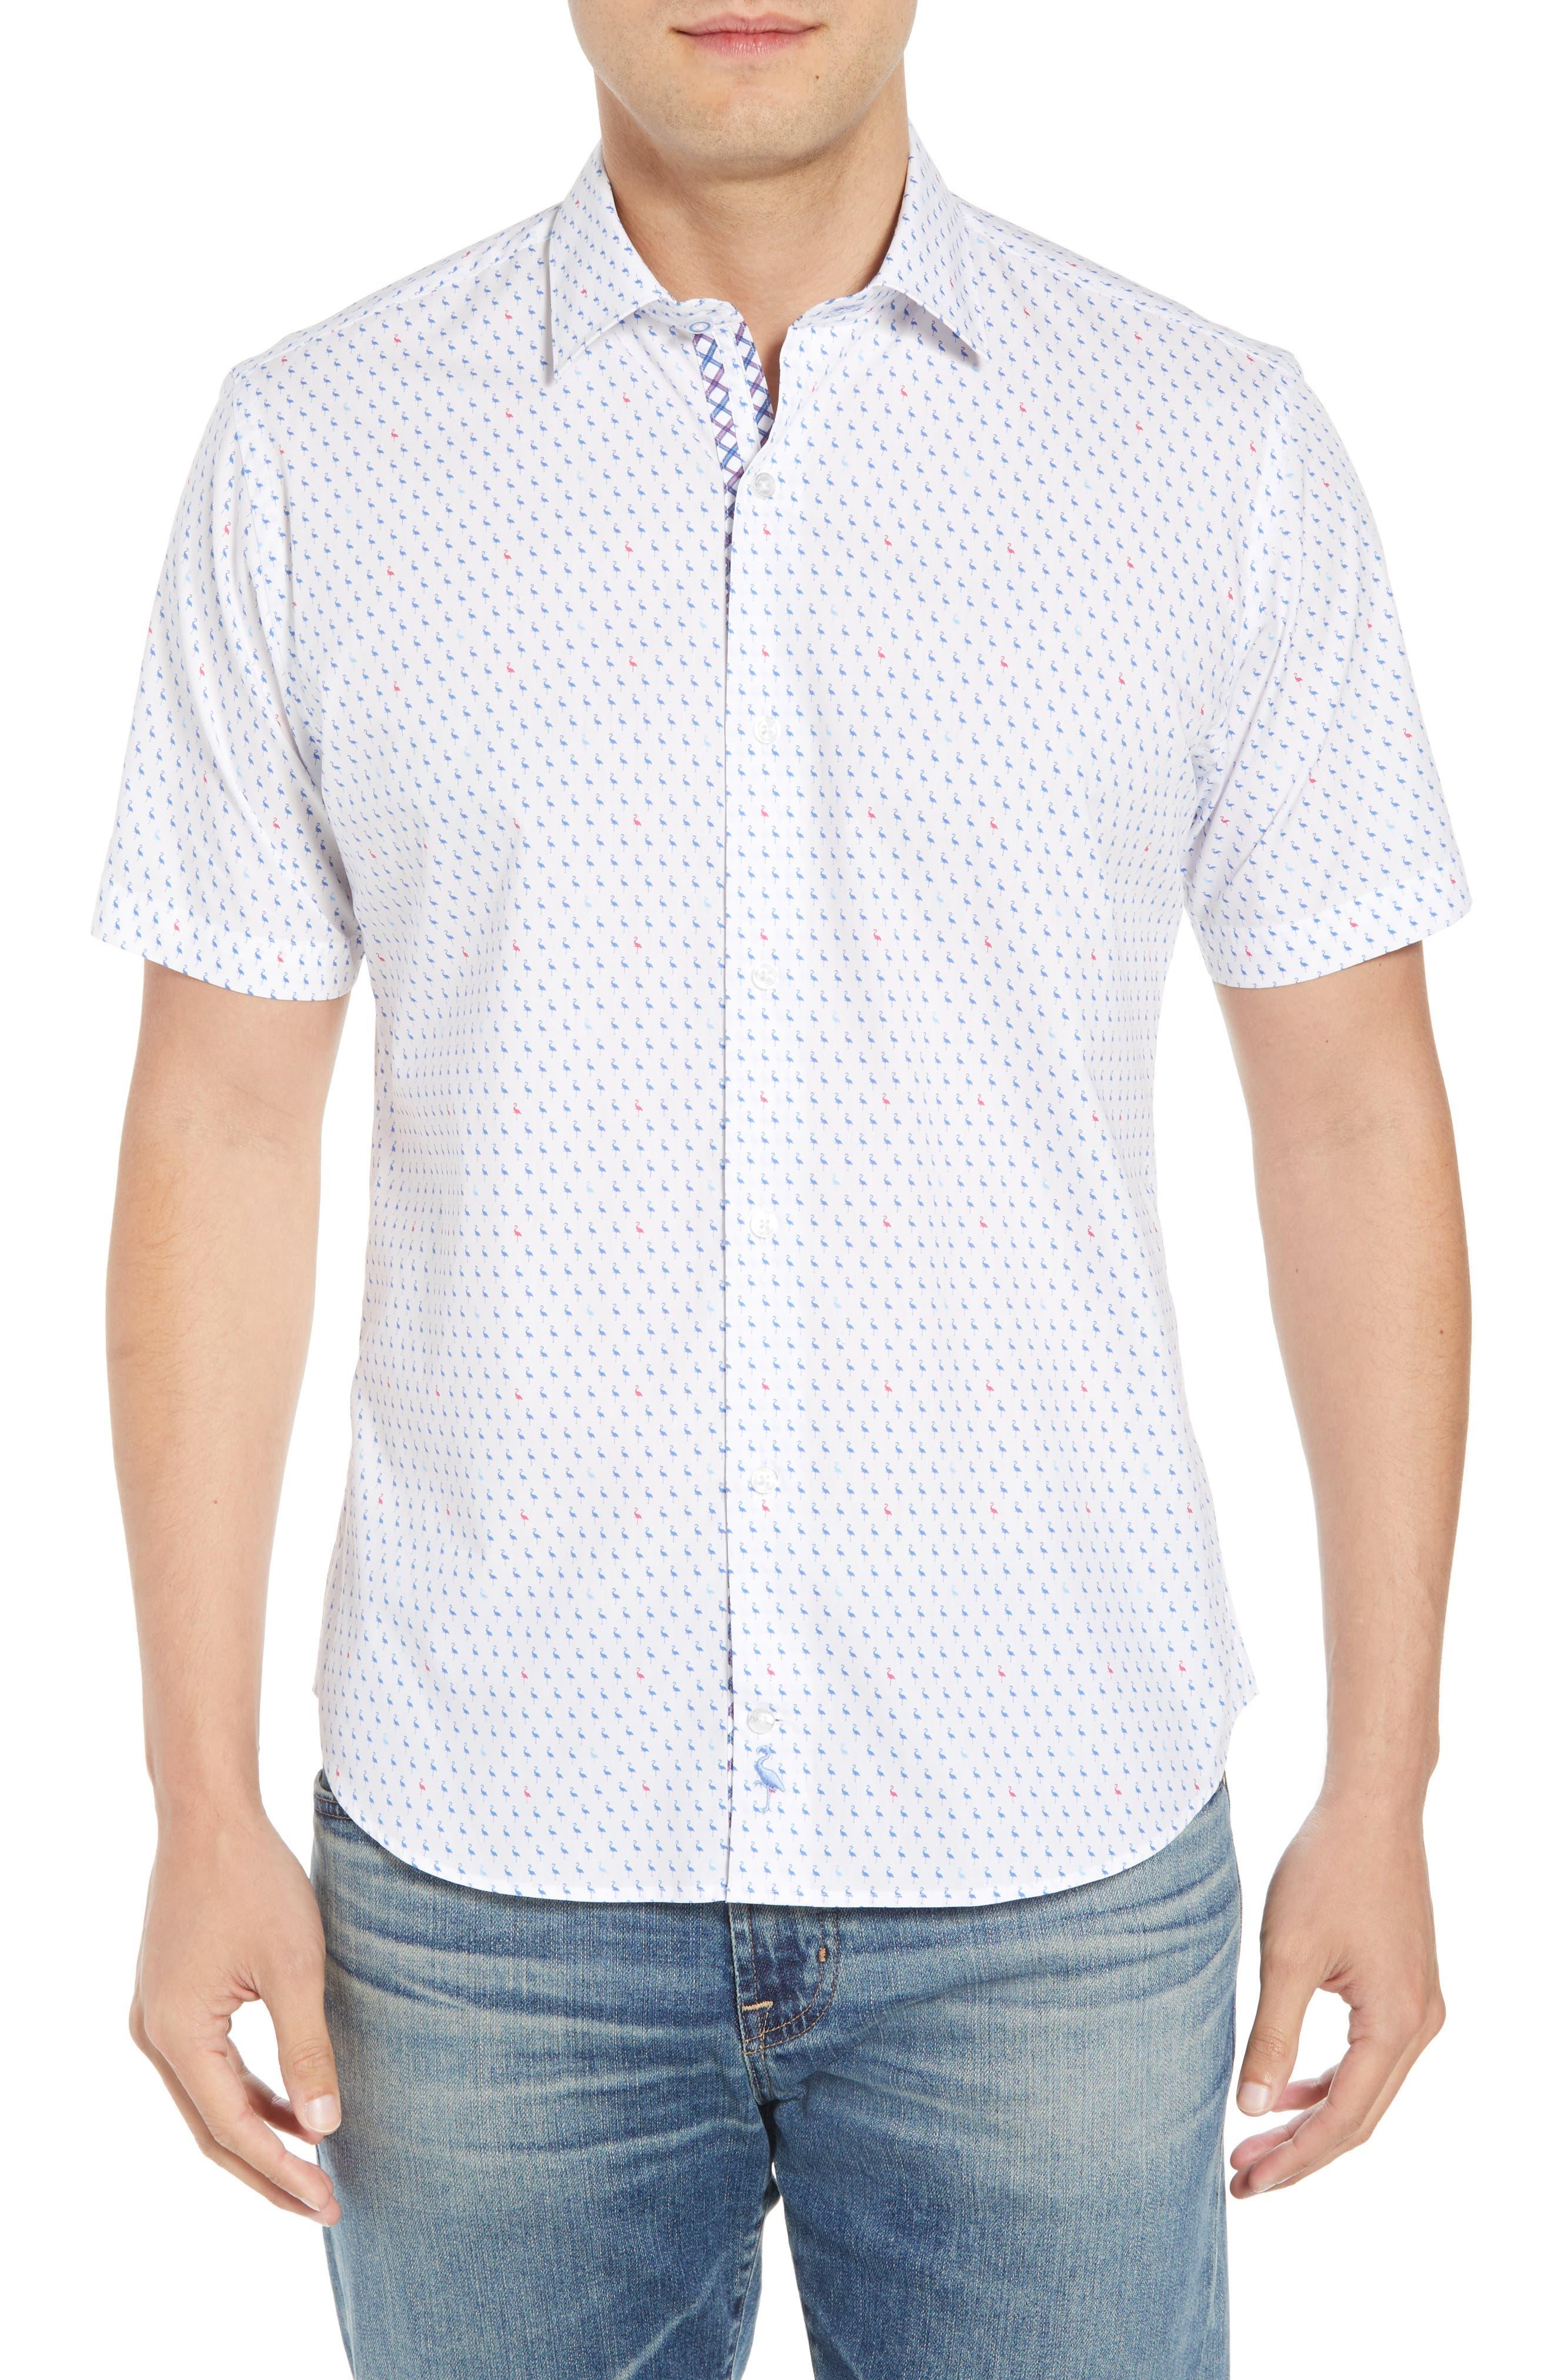 Arrie Regular Fit Print Sport Shirt,                             Main thumbnail 1, color,                             490